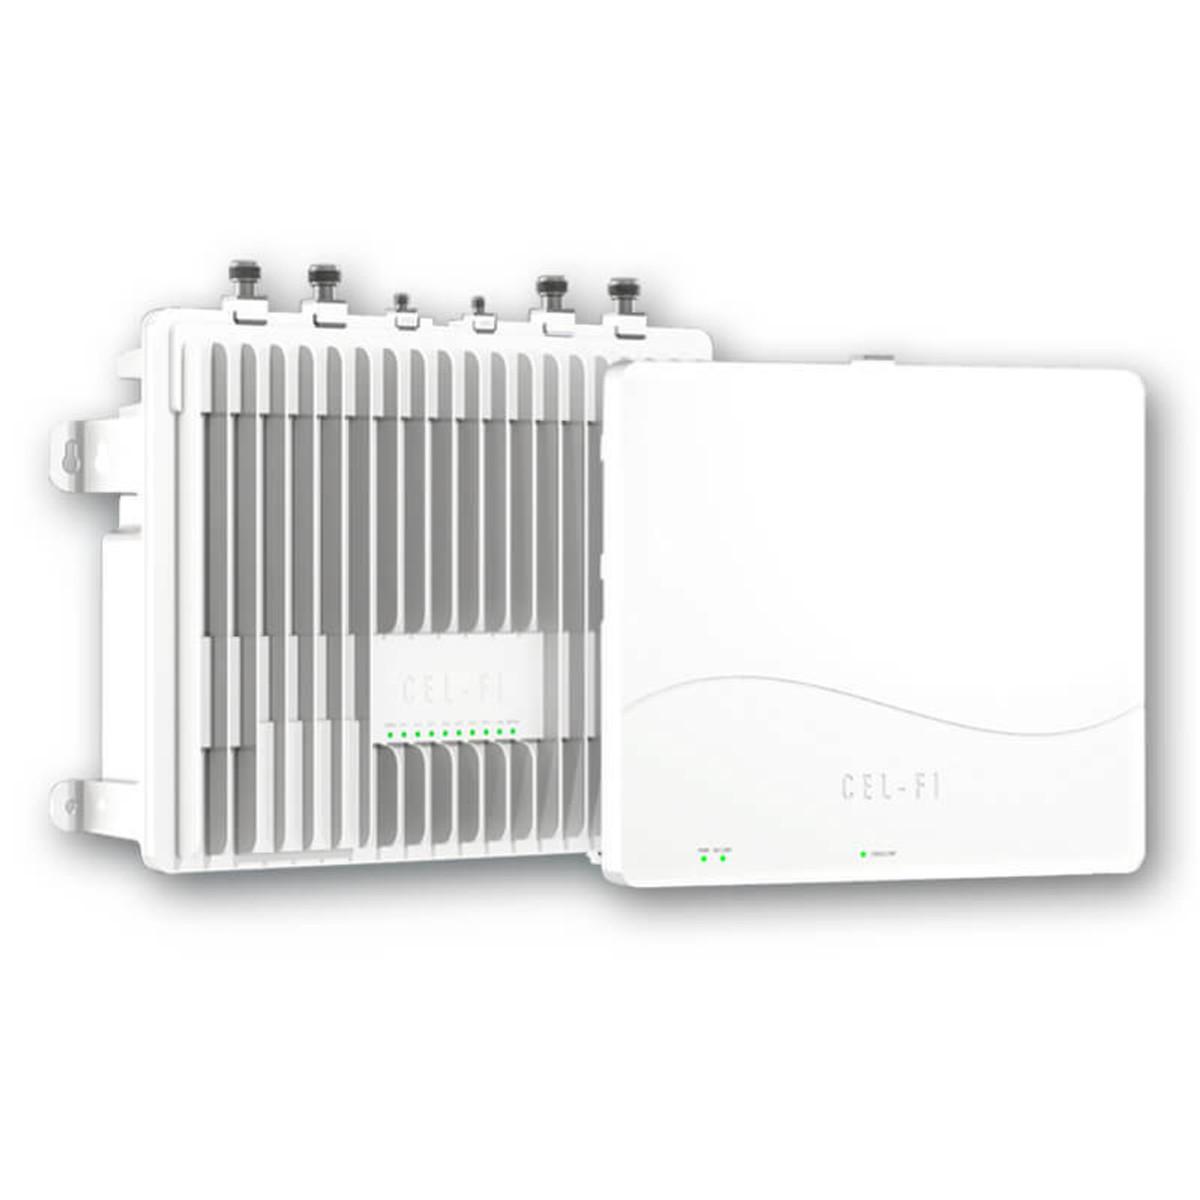 Cel-Fi Cel-Fi QUATRA 4000 Enterprise Cell Signal Booster System